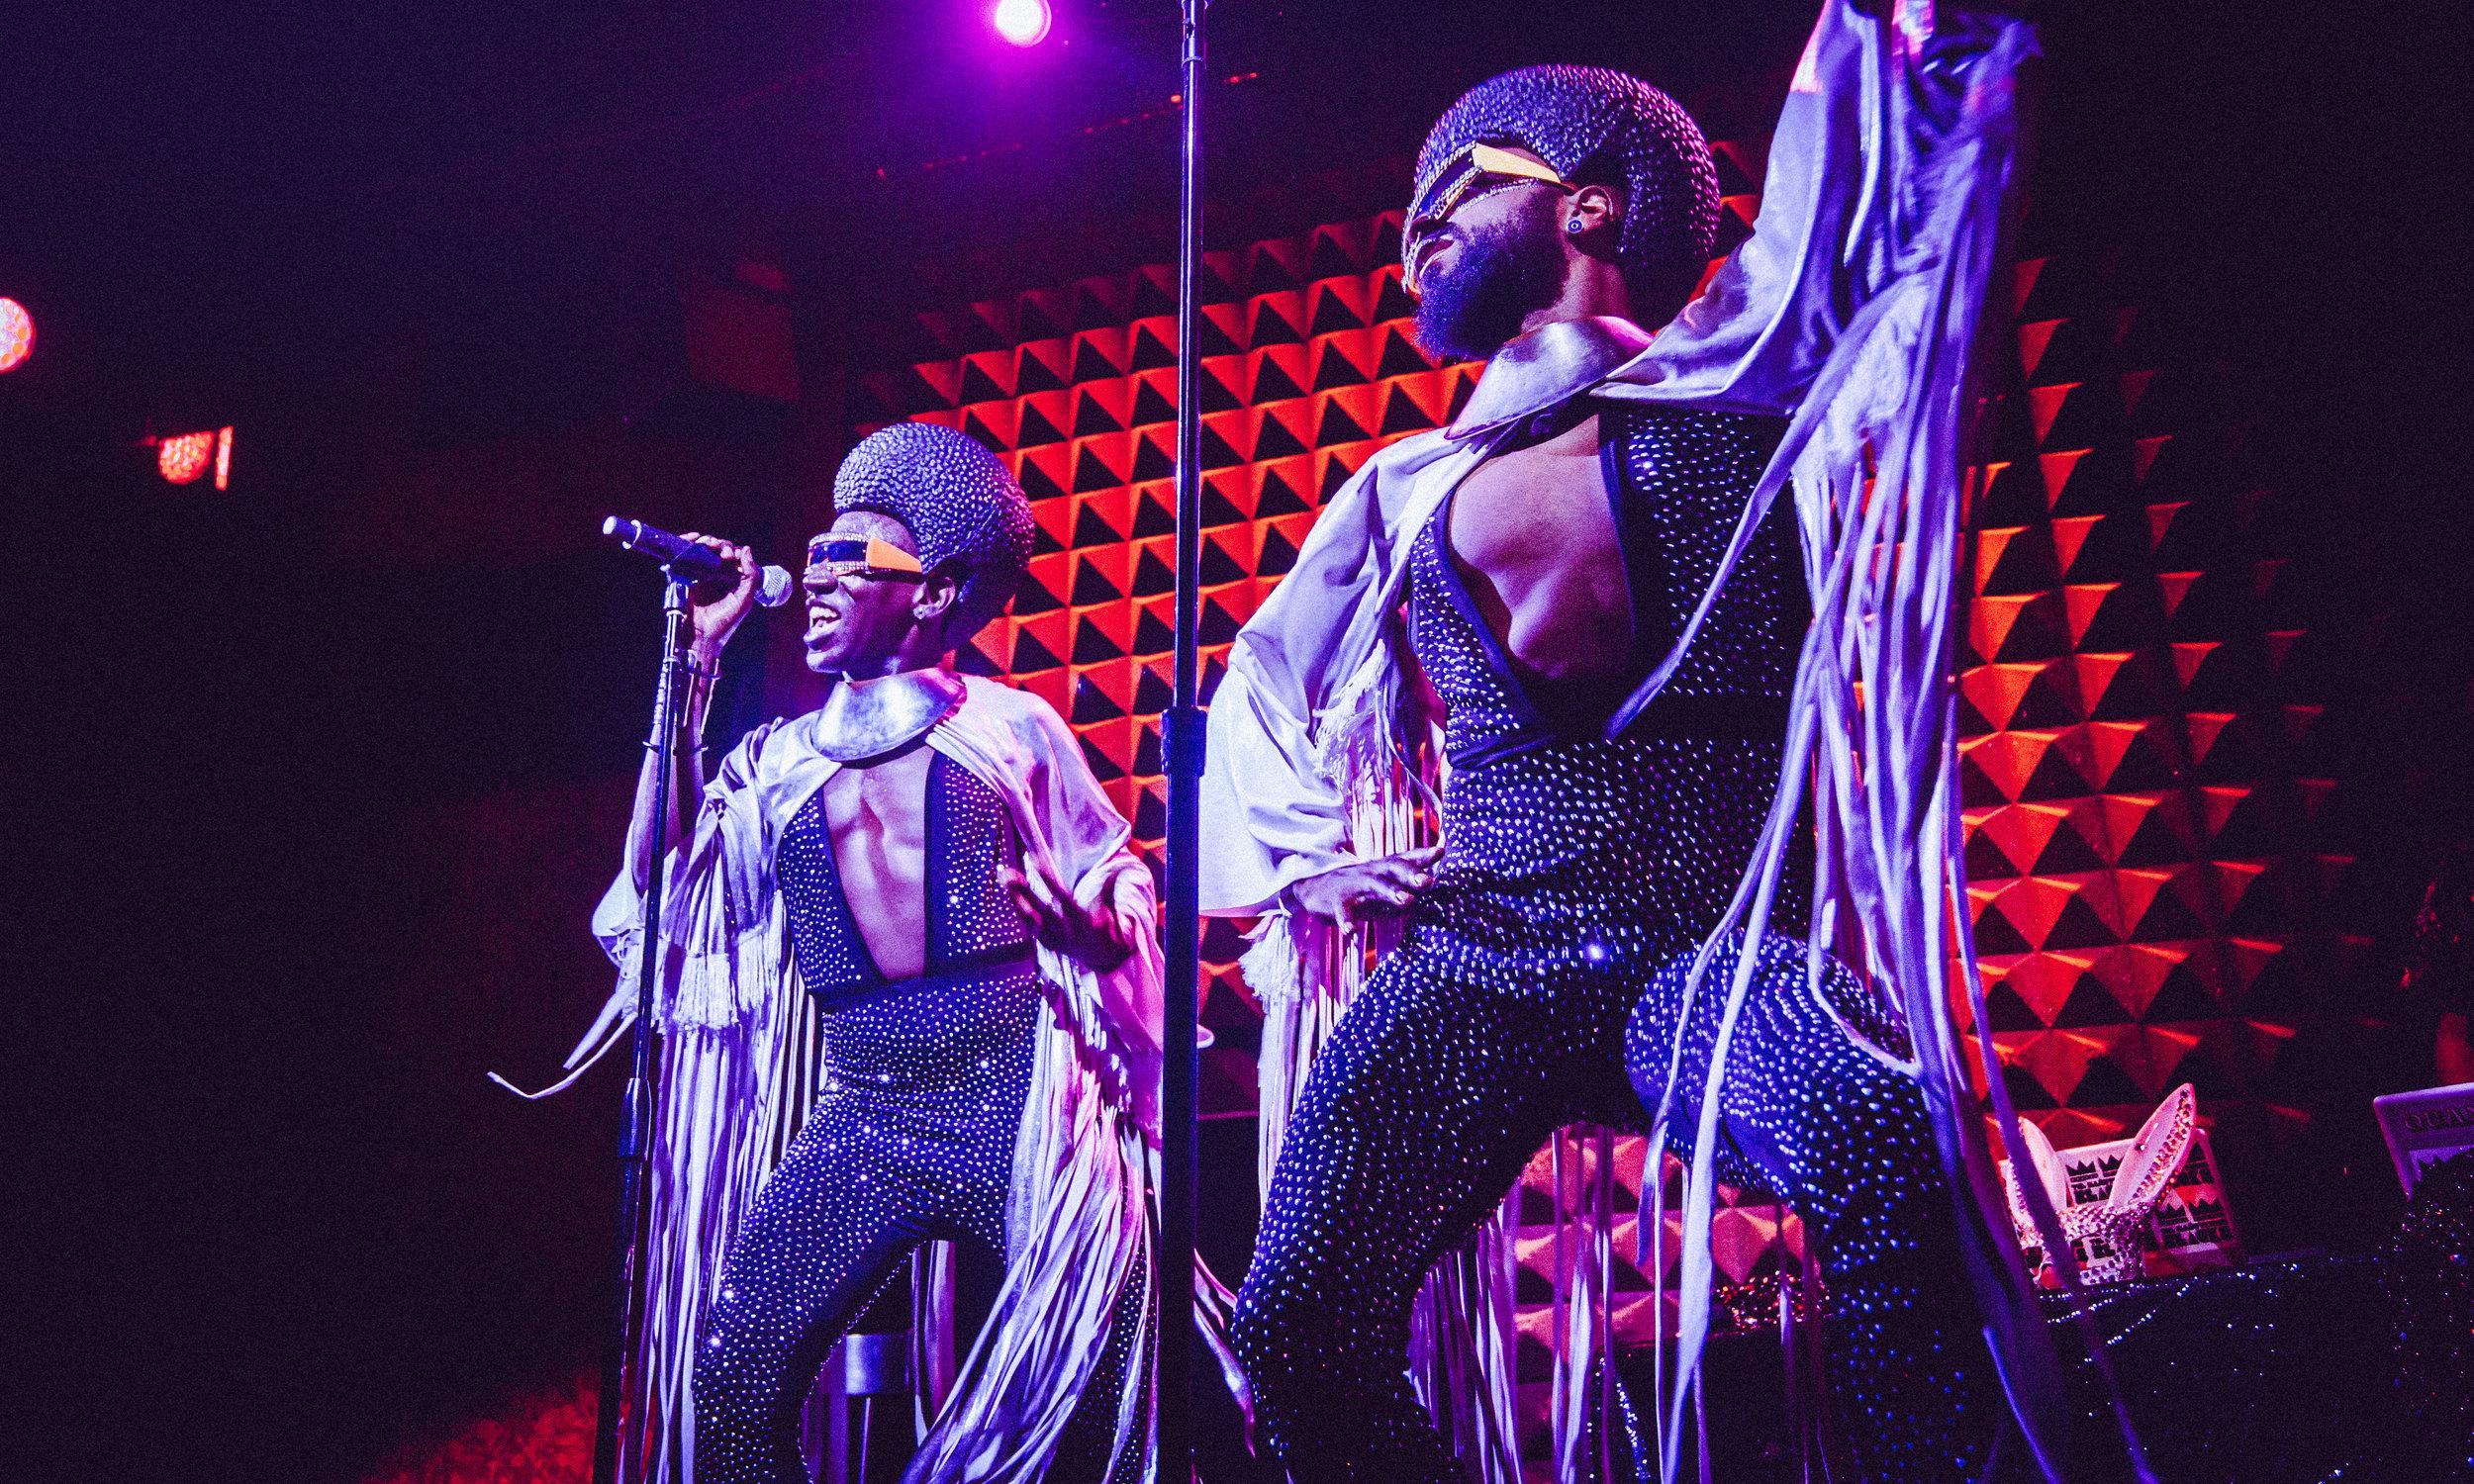 The Illustrious Blacks - @ Joes Pub the Public Theater